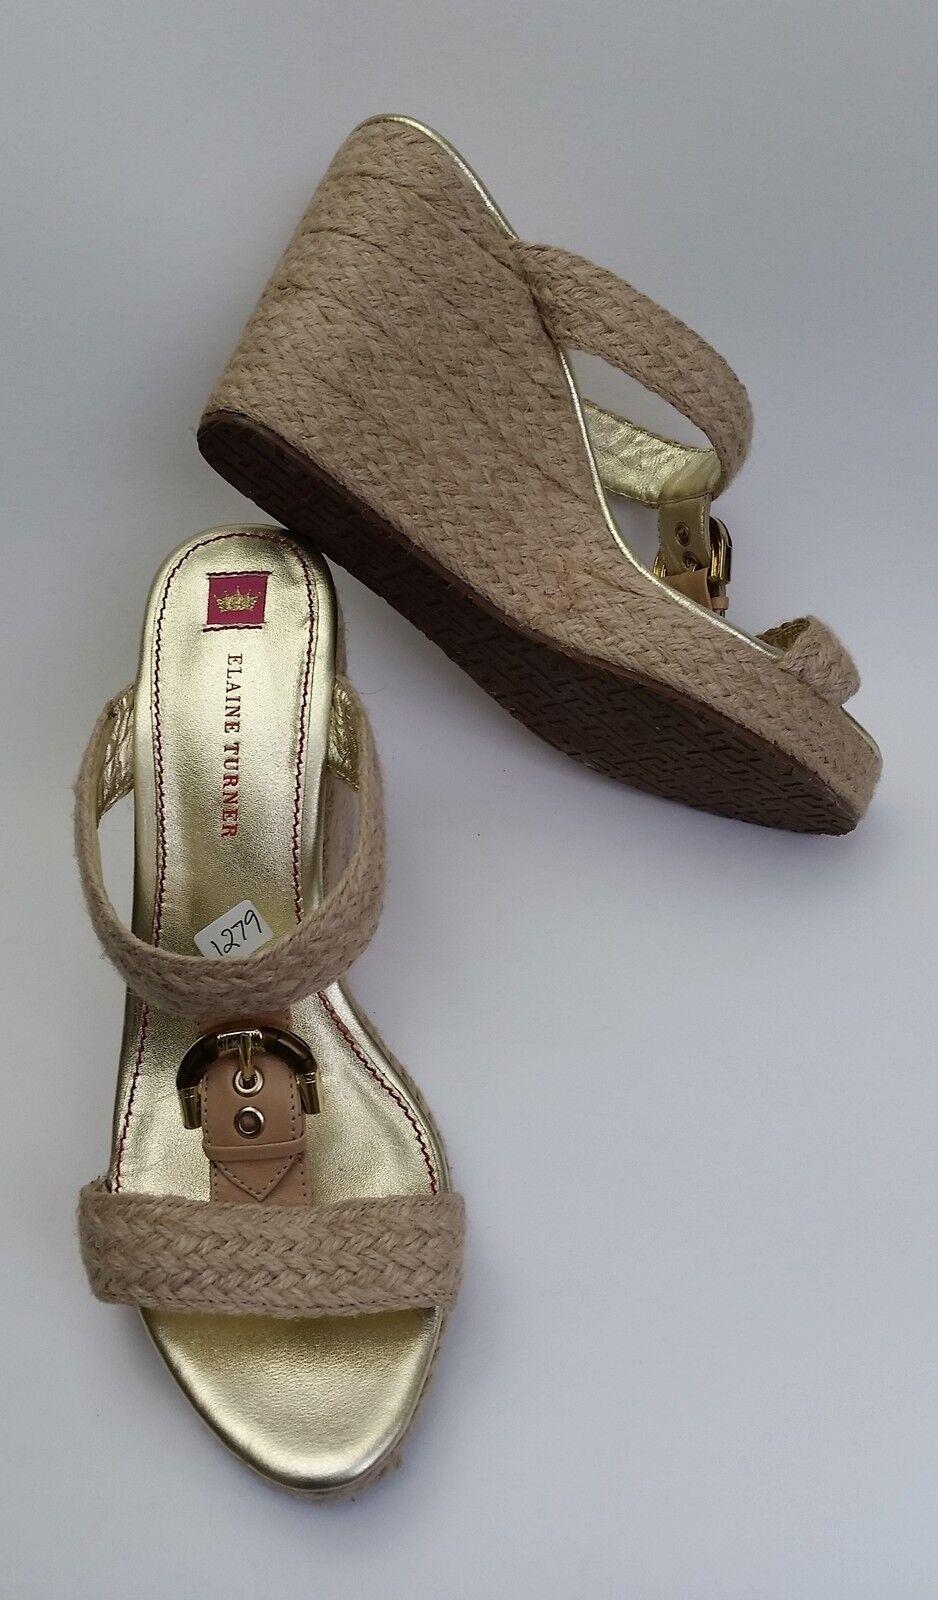 7c21f79cbf39f Elaine Turner shoes Sandals Natural Espadrilles Slip-On Size 10 ...